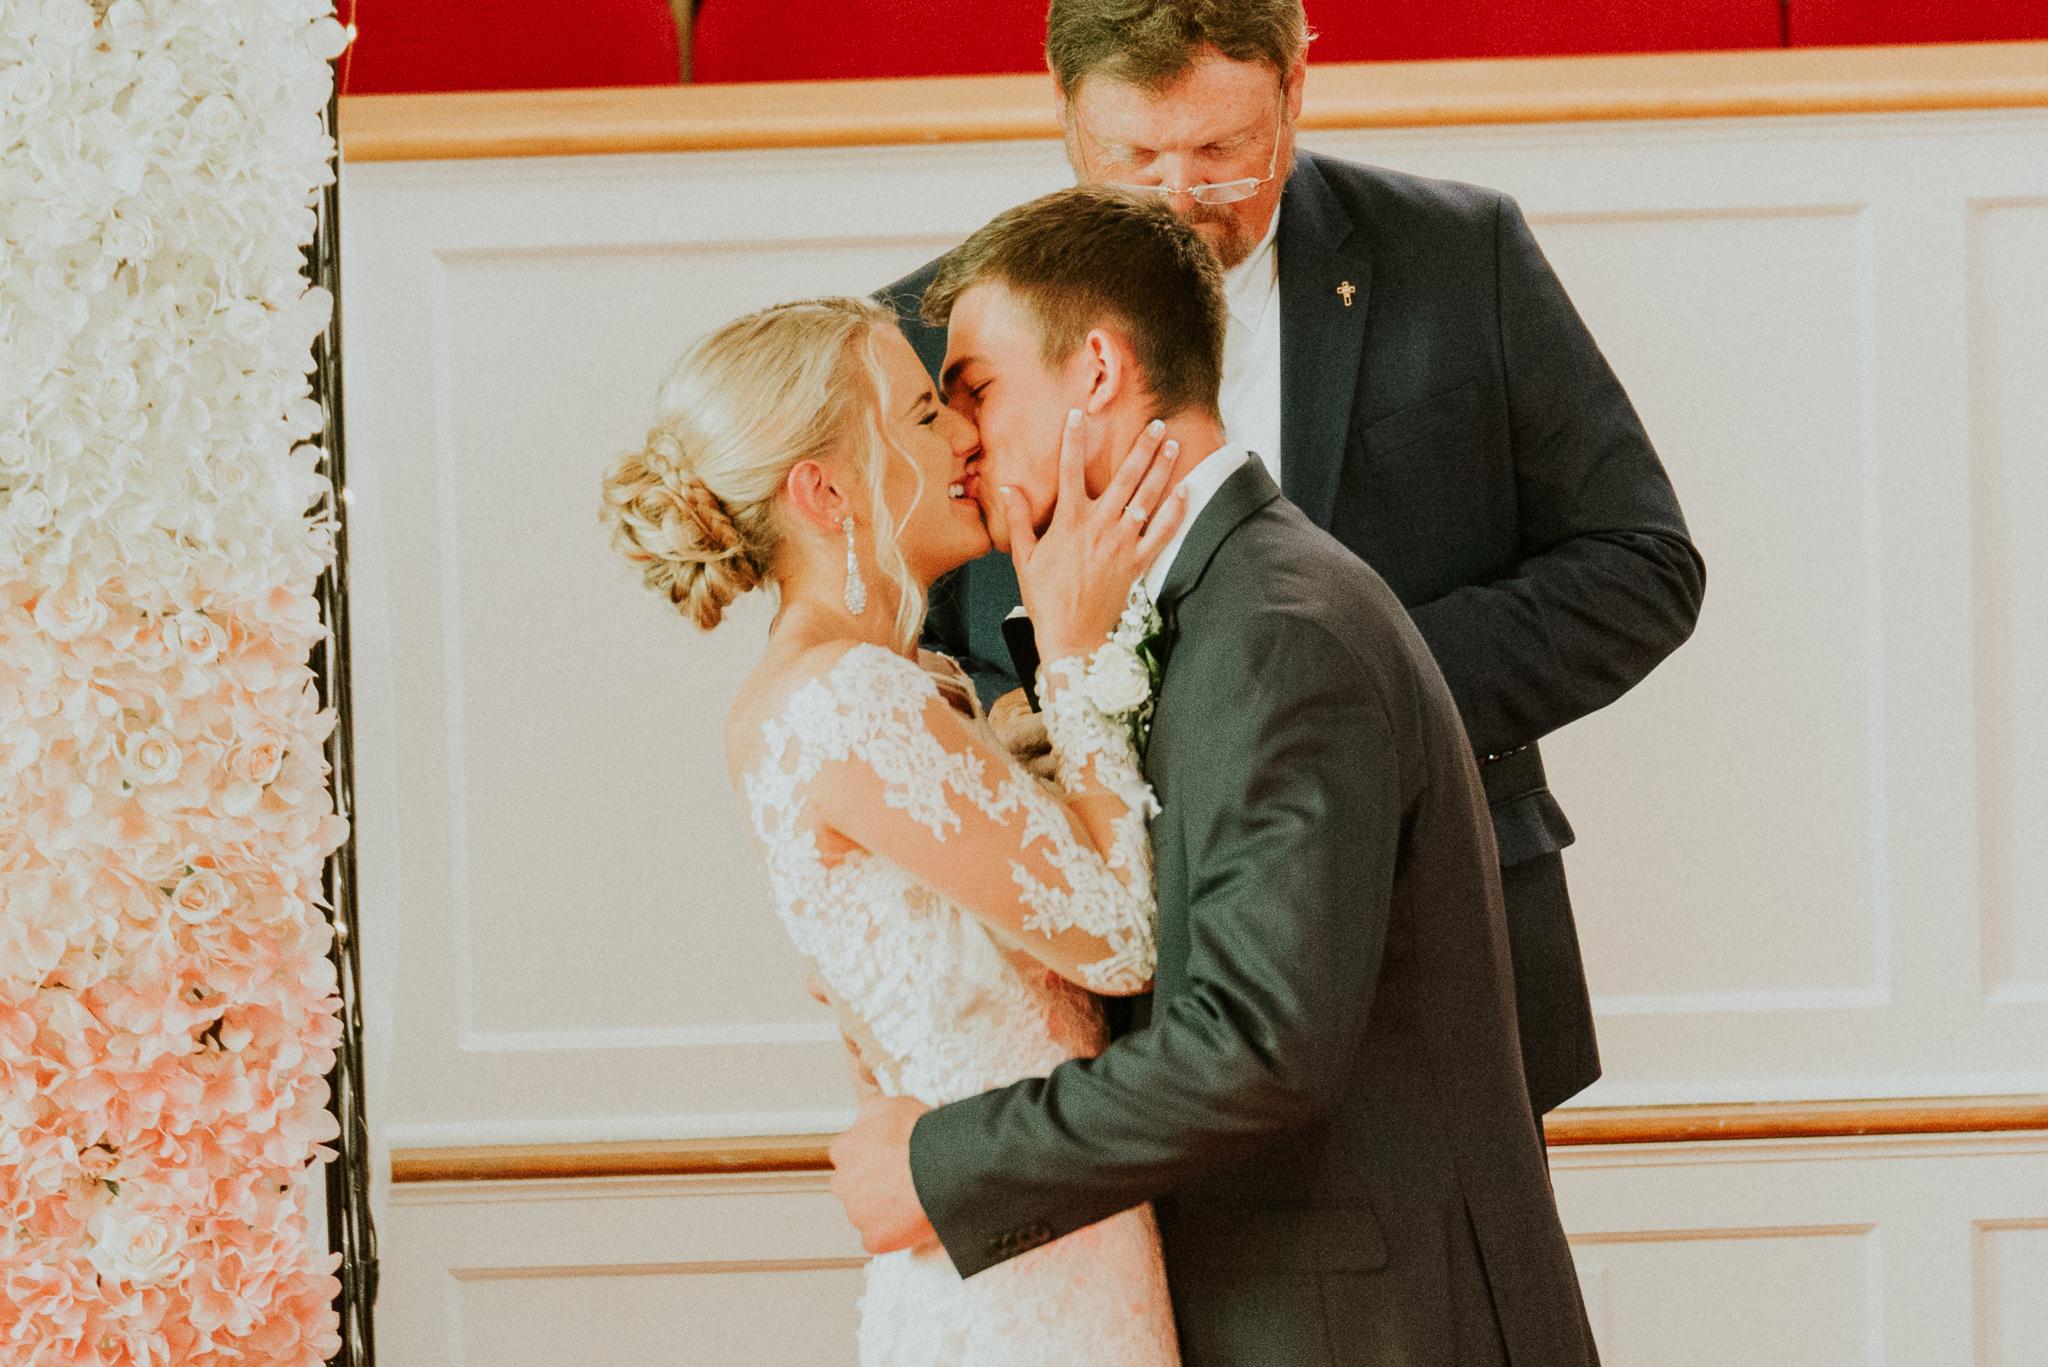 east-tn-wedding-photographer-tennessee-elopement-photographer-kingsport-tn-wedding-photographer (28 of 50).jpg